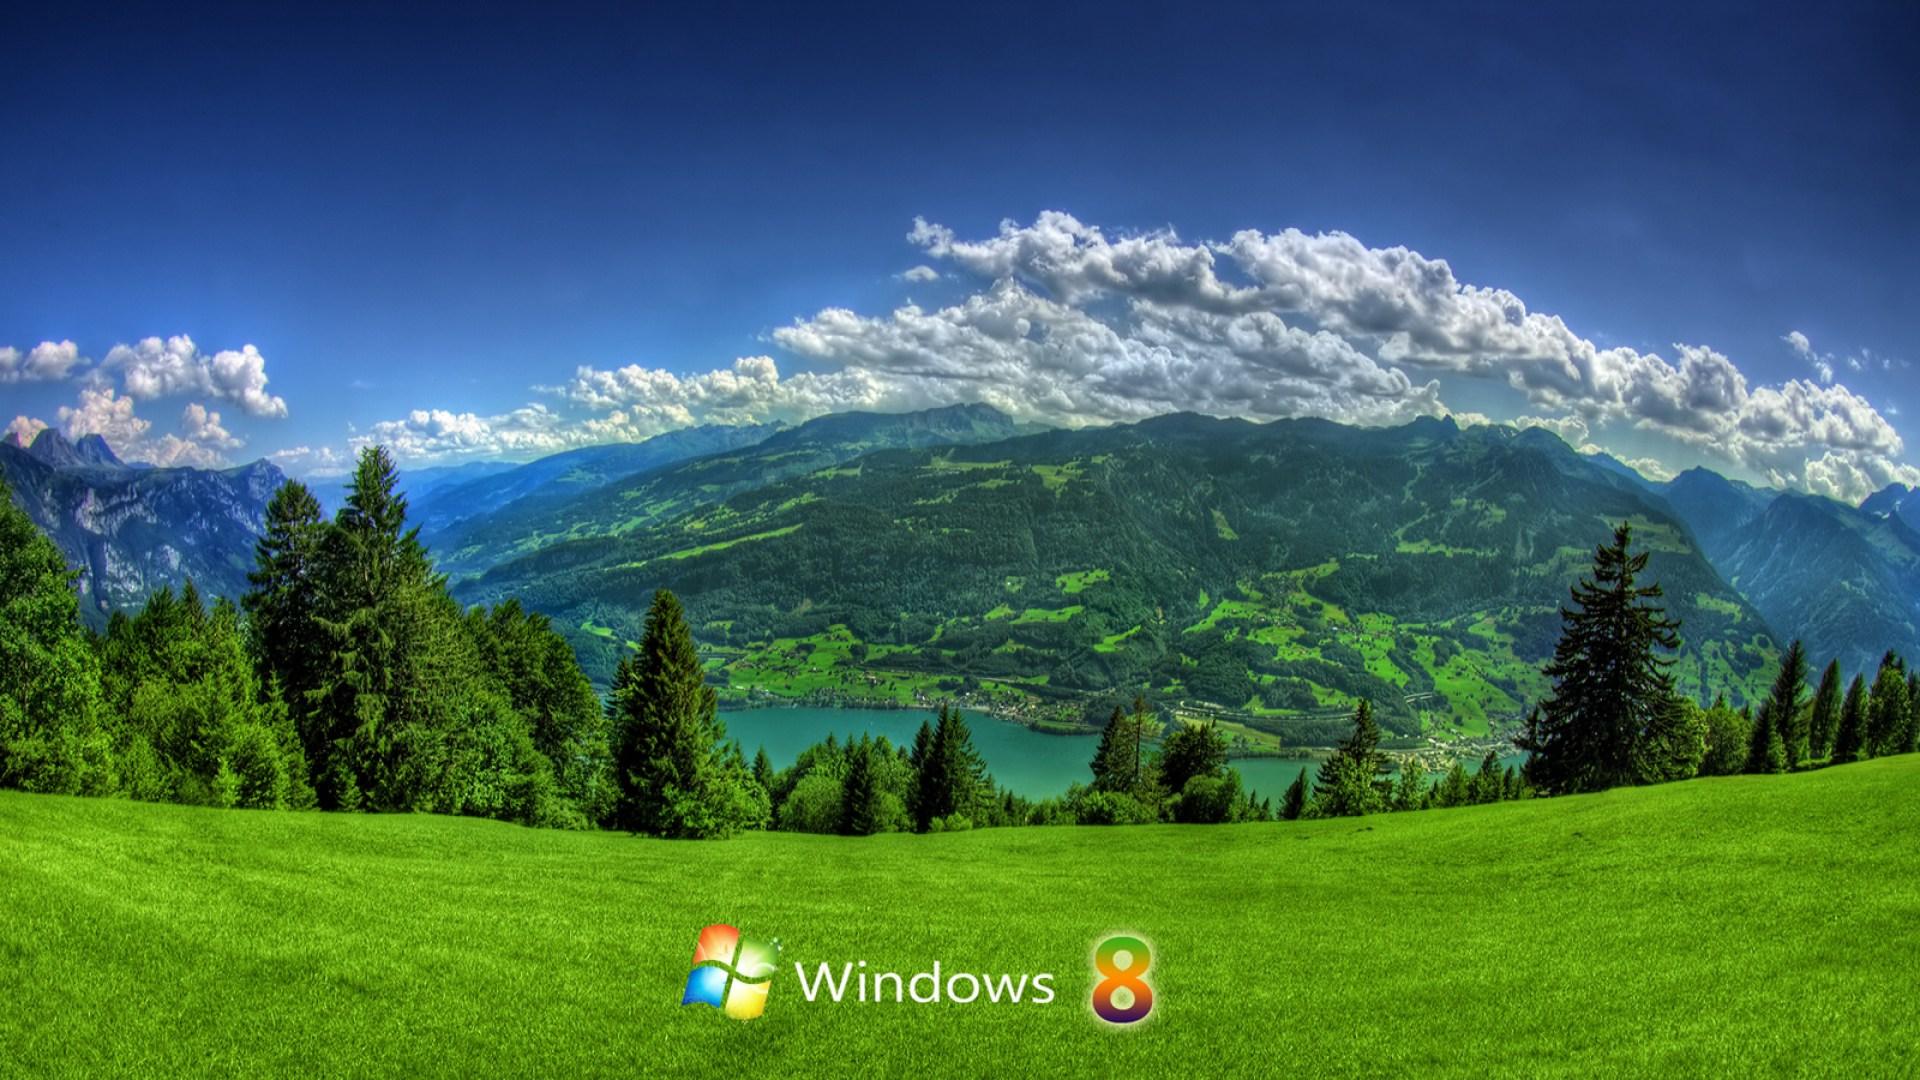 windows 8 high resolution wallpaper nature 14 500x281 photo 1920x1080